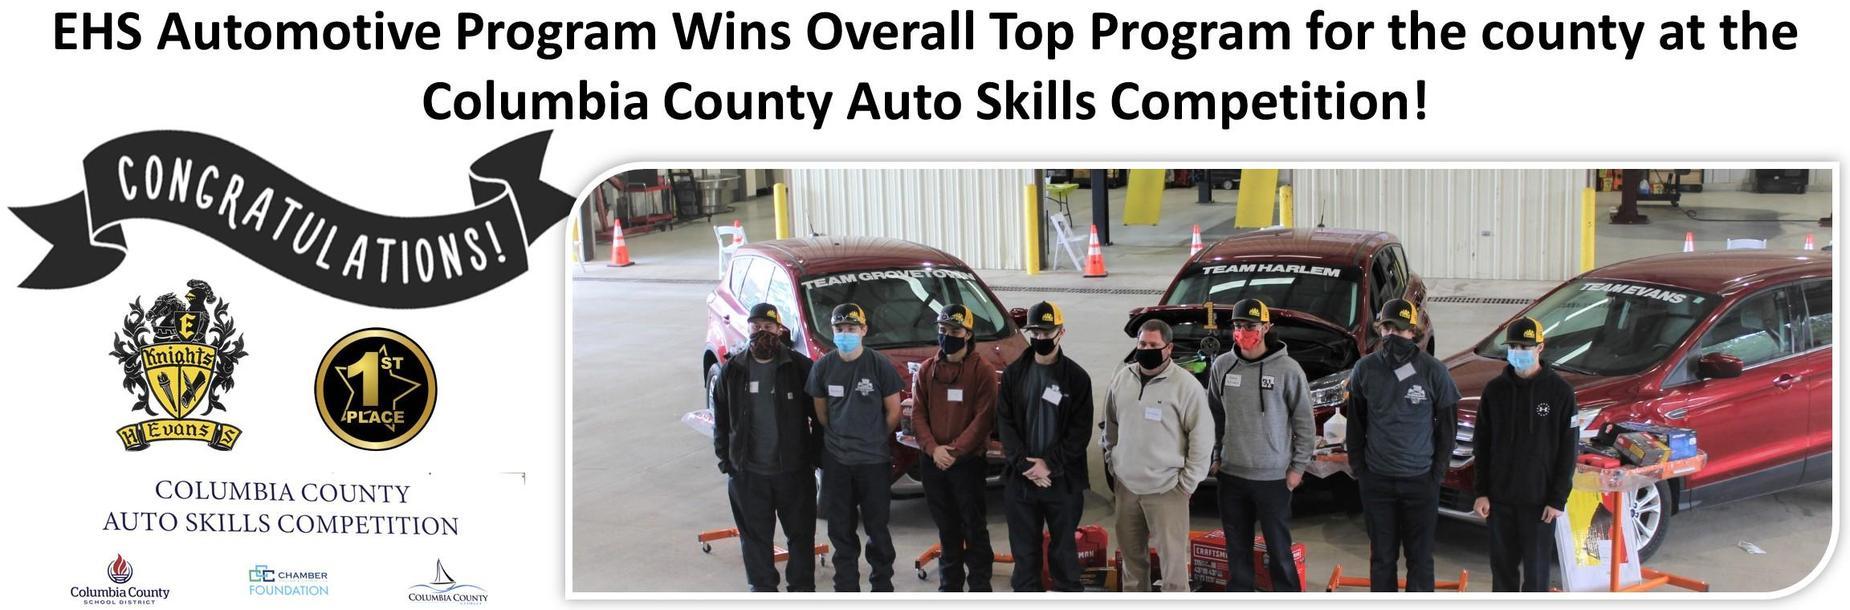 automotive wins